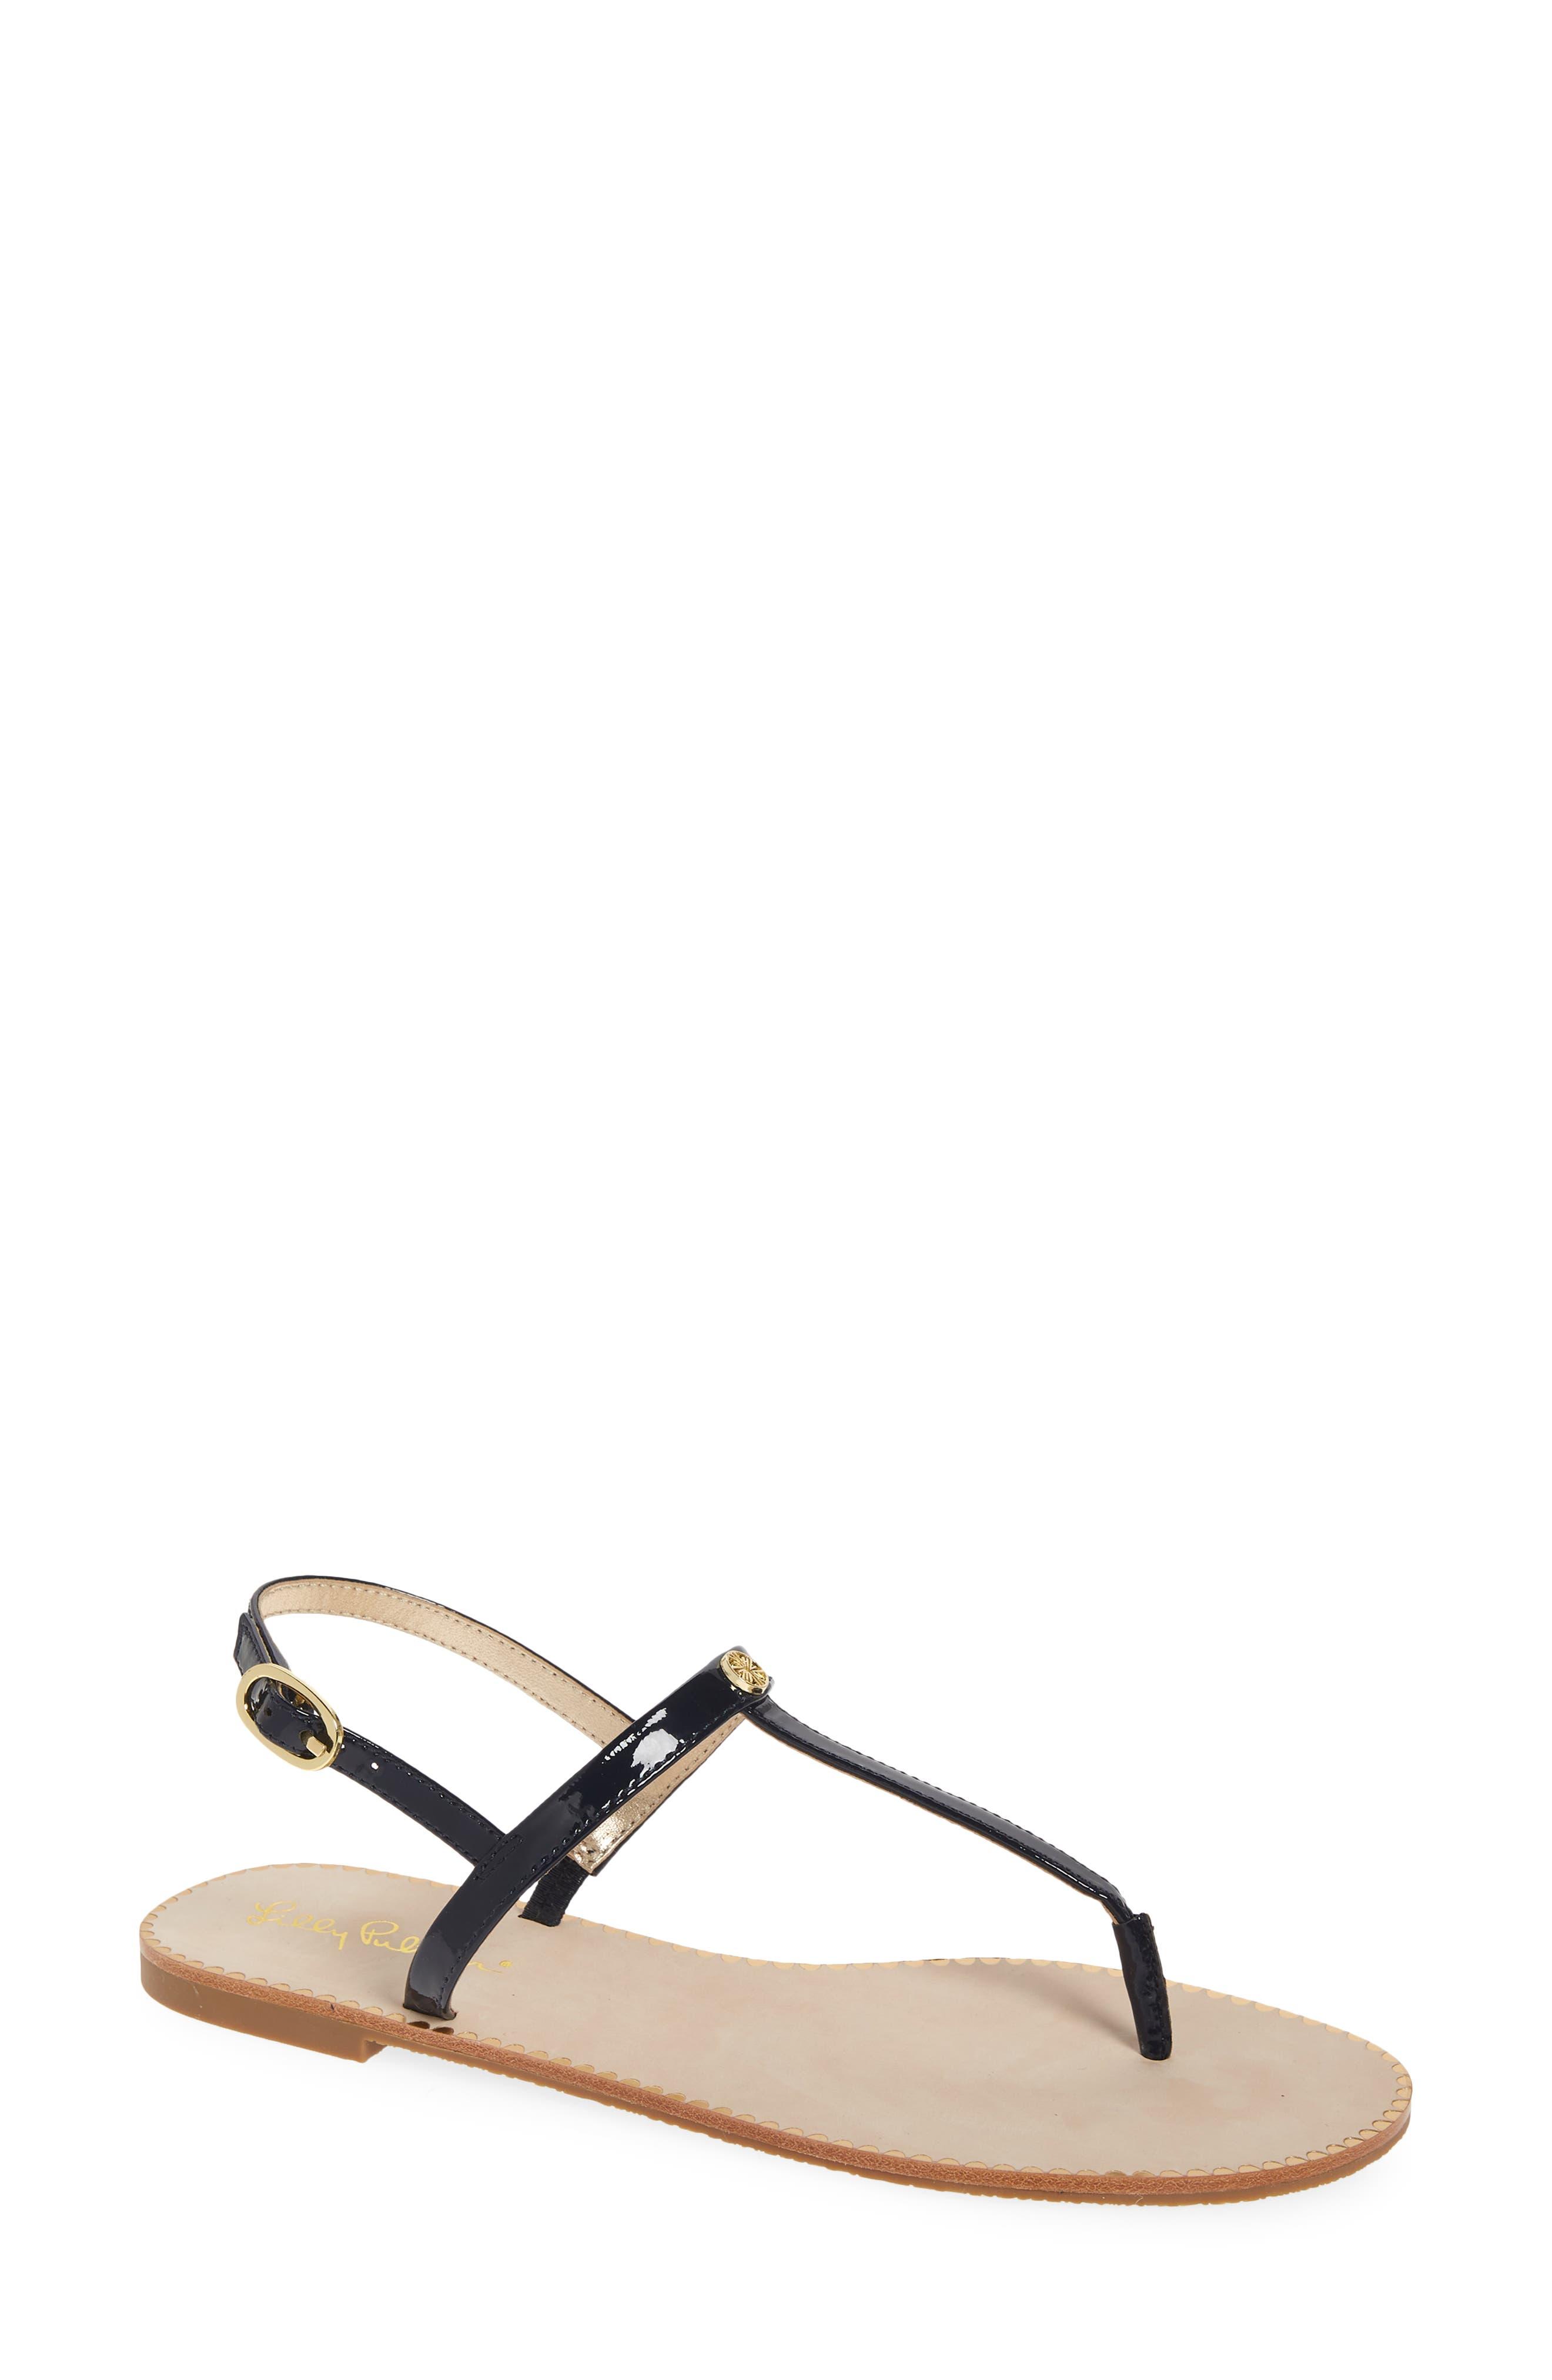 Women's Lilly Pulitzer Rita T-Strap Sandal